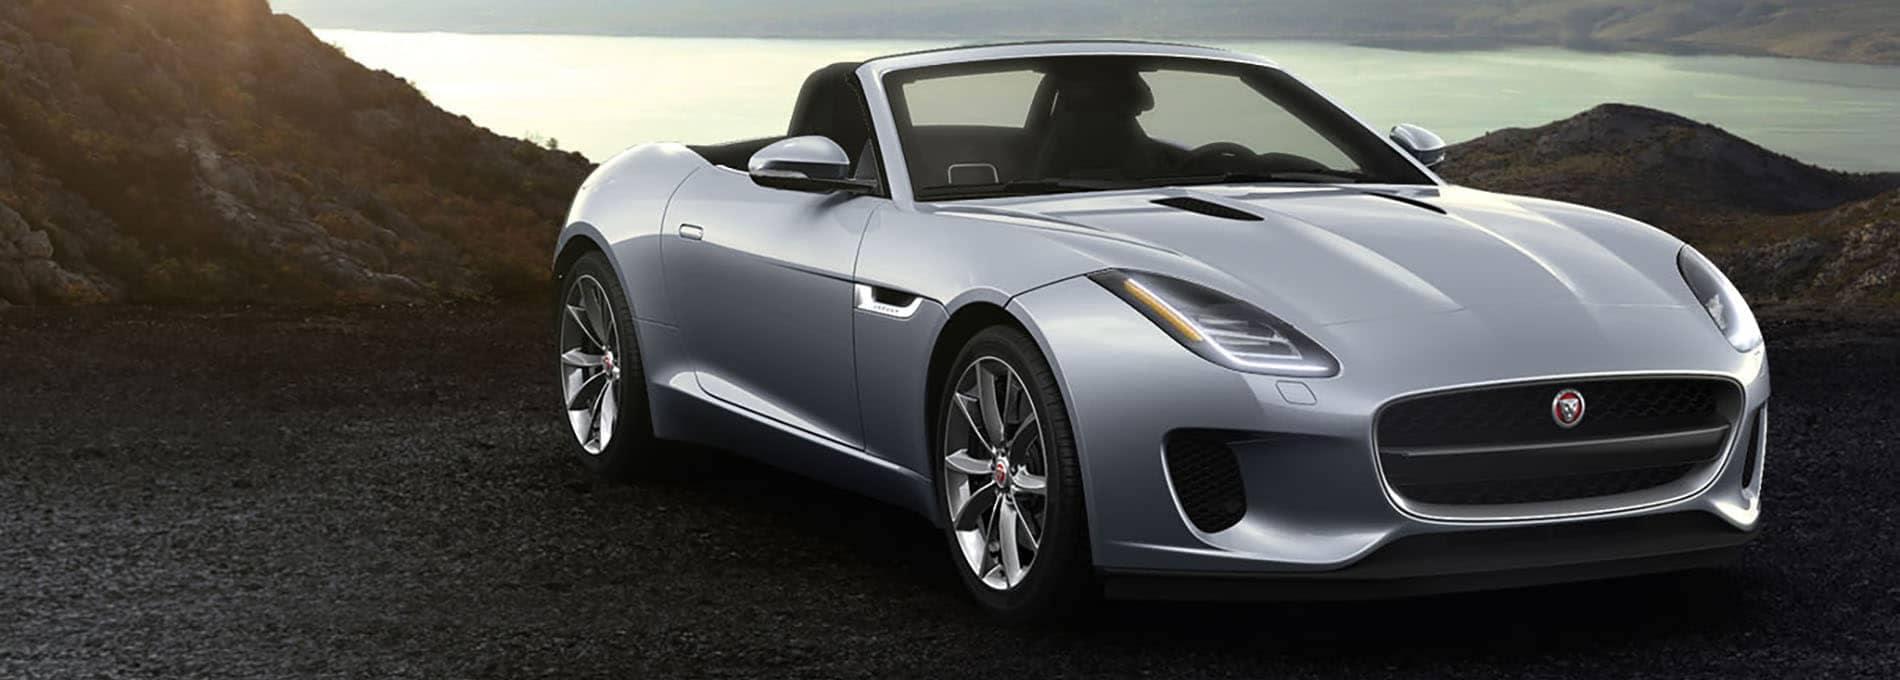 2019 Jaguar F-Type Convertible Parked